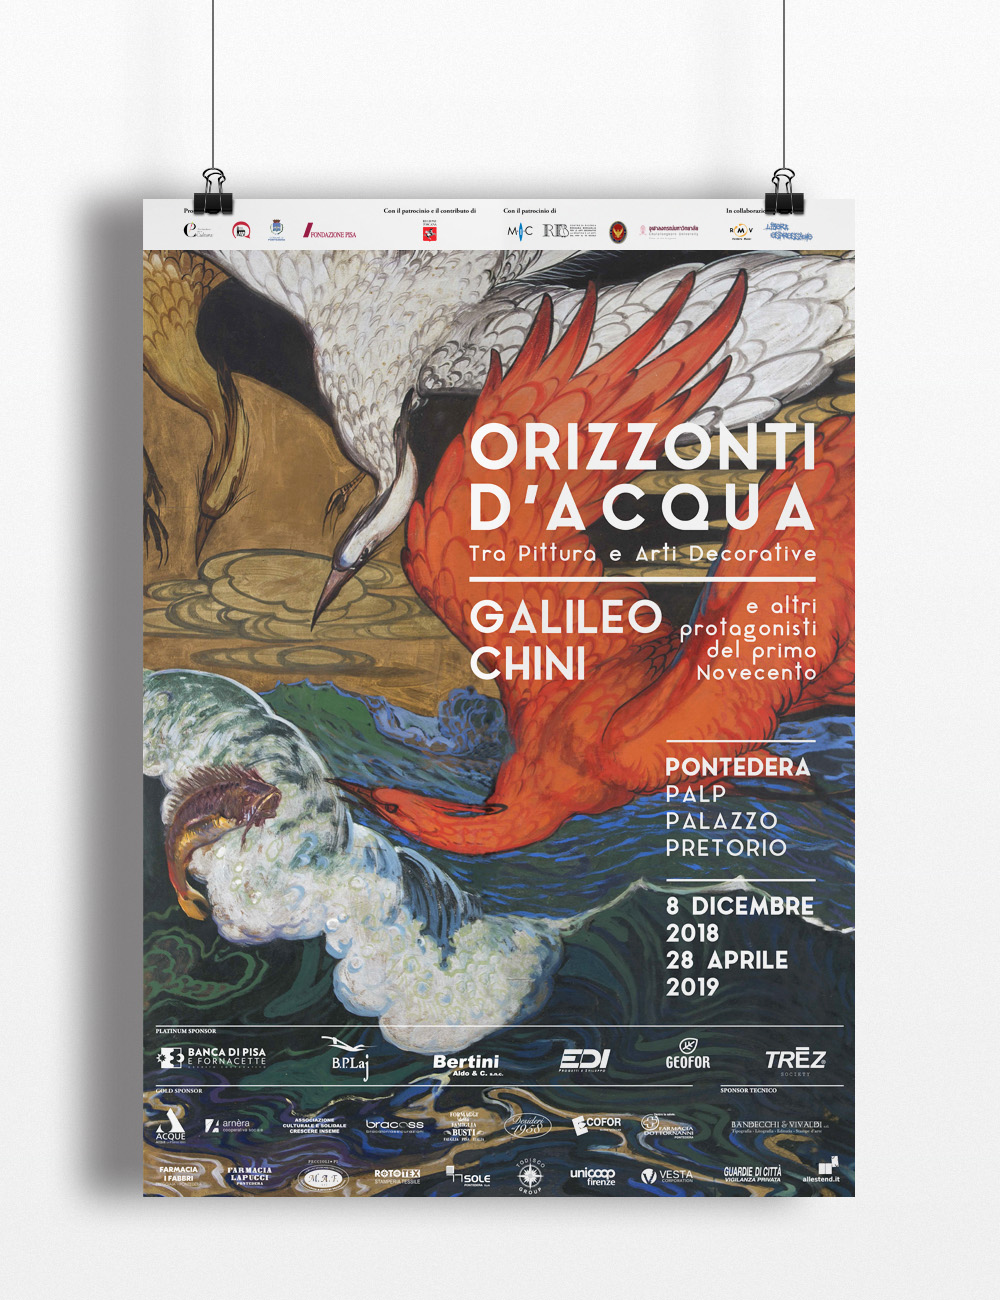 Manifesto Mostra, Galileo Chini, Palp, Pontedera, Design Deferrari modesti